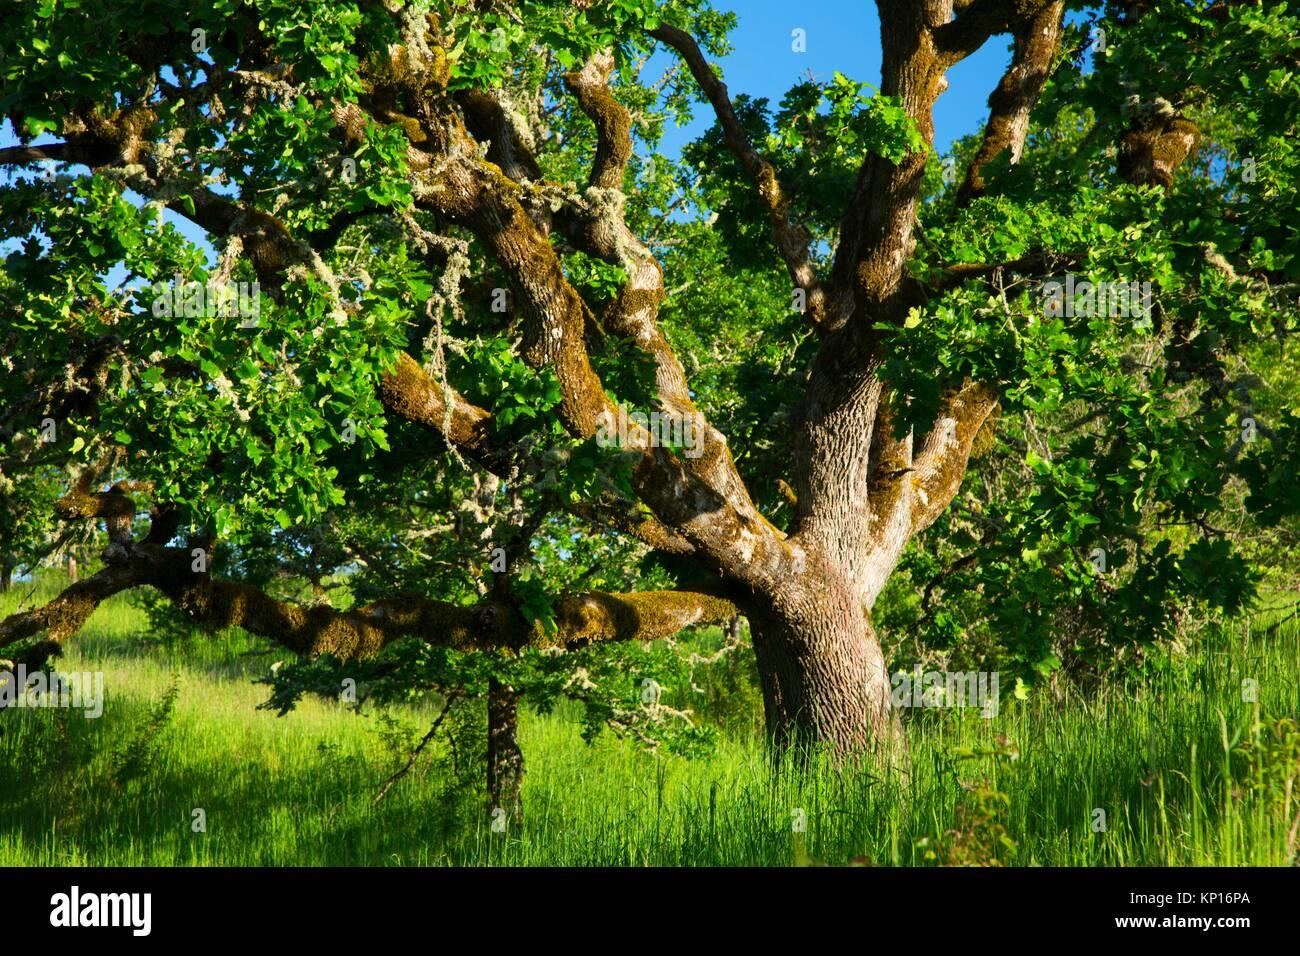 Oregon oak along Rich Guadagno Memorial Trail, Baskett Slough National Wildlife Refuge, Oregon. - Stock Image